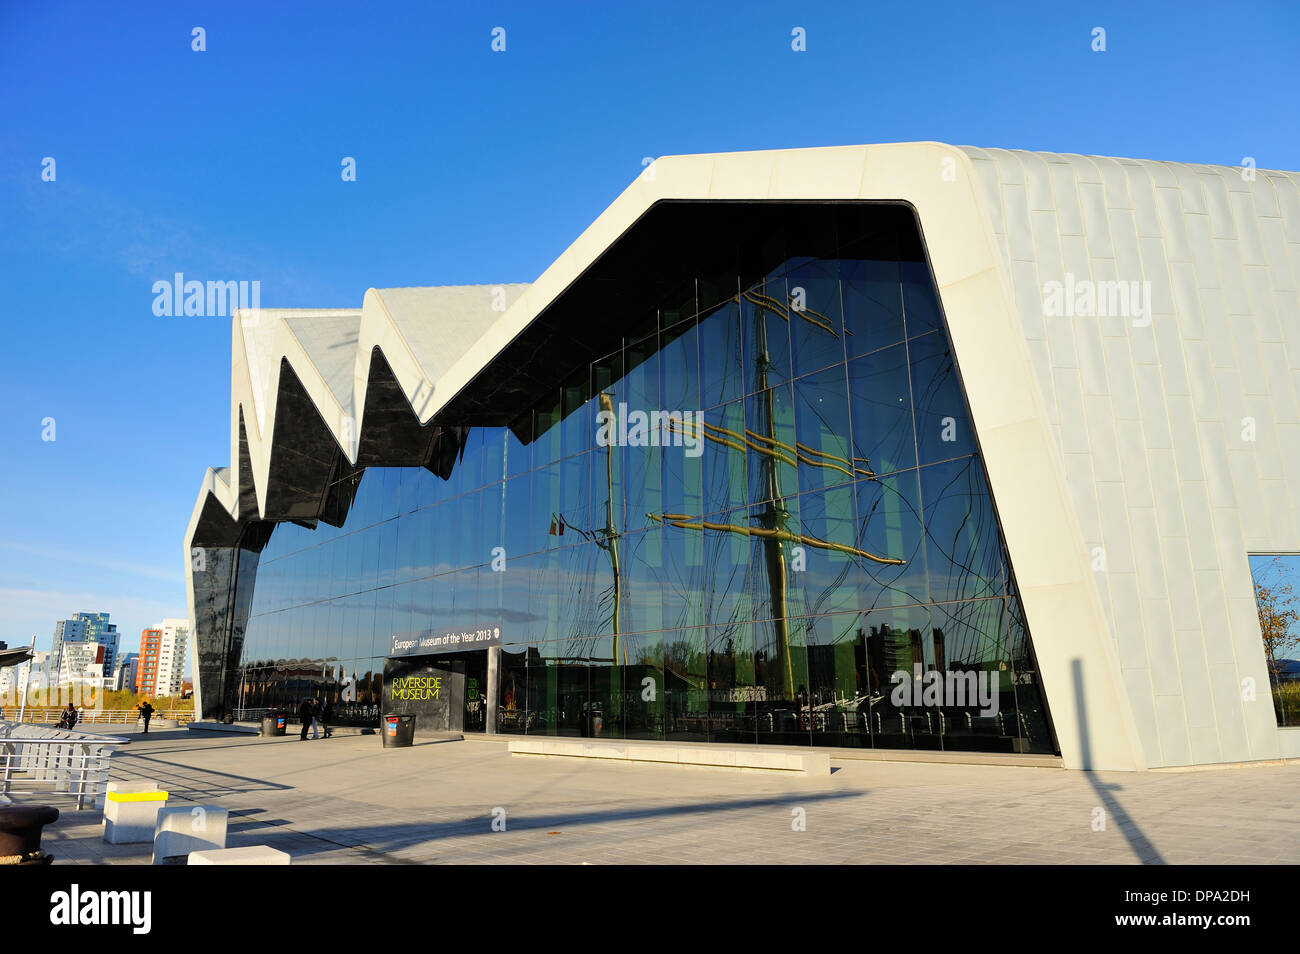 New Riverside Museum of Transport, Glasgow, Scotland - Stock Image